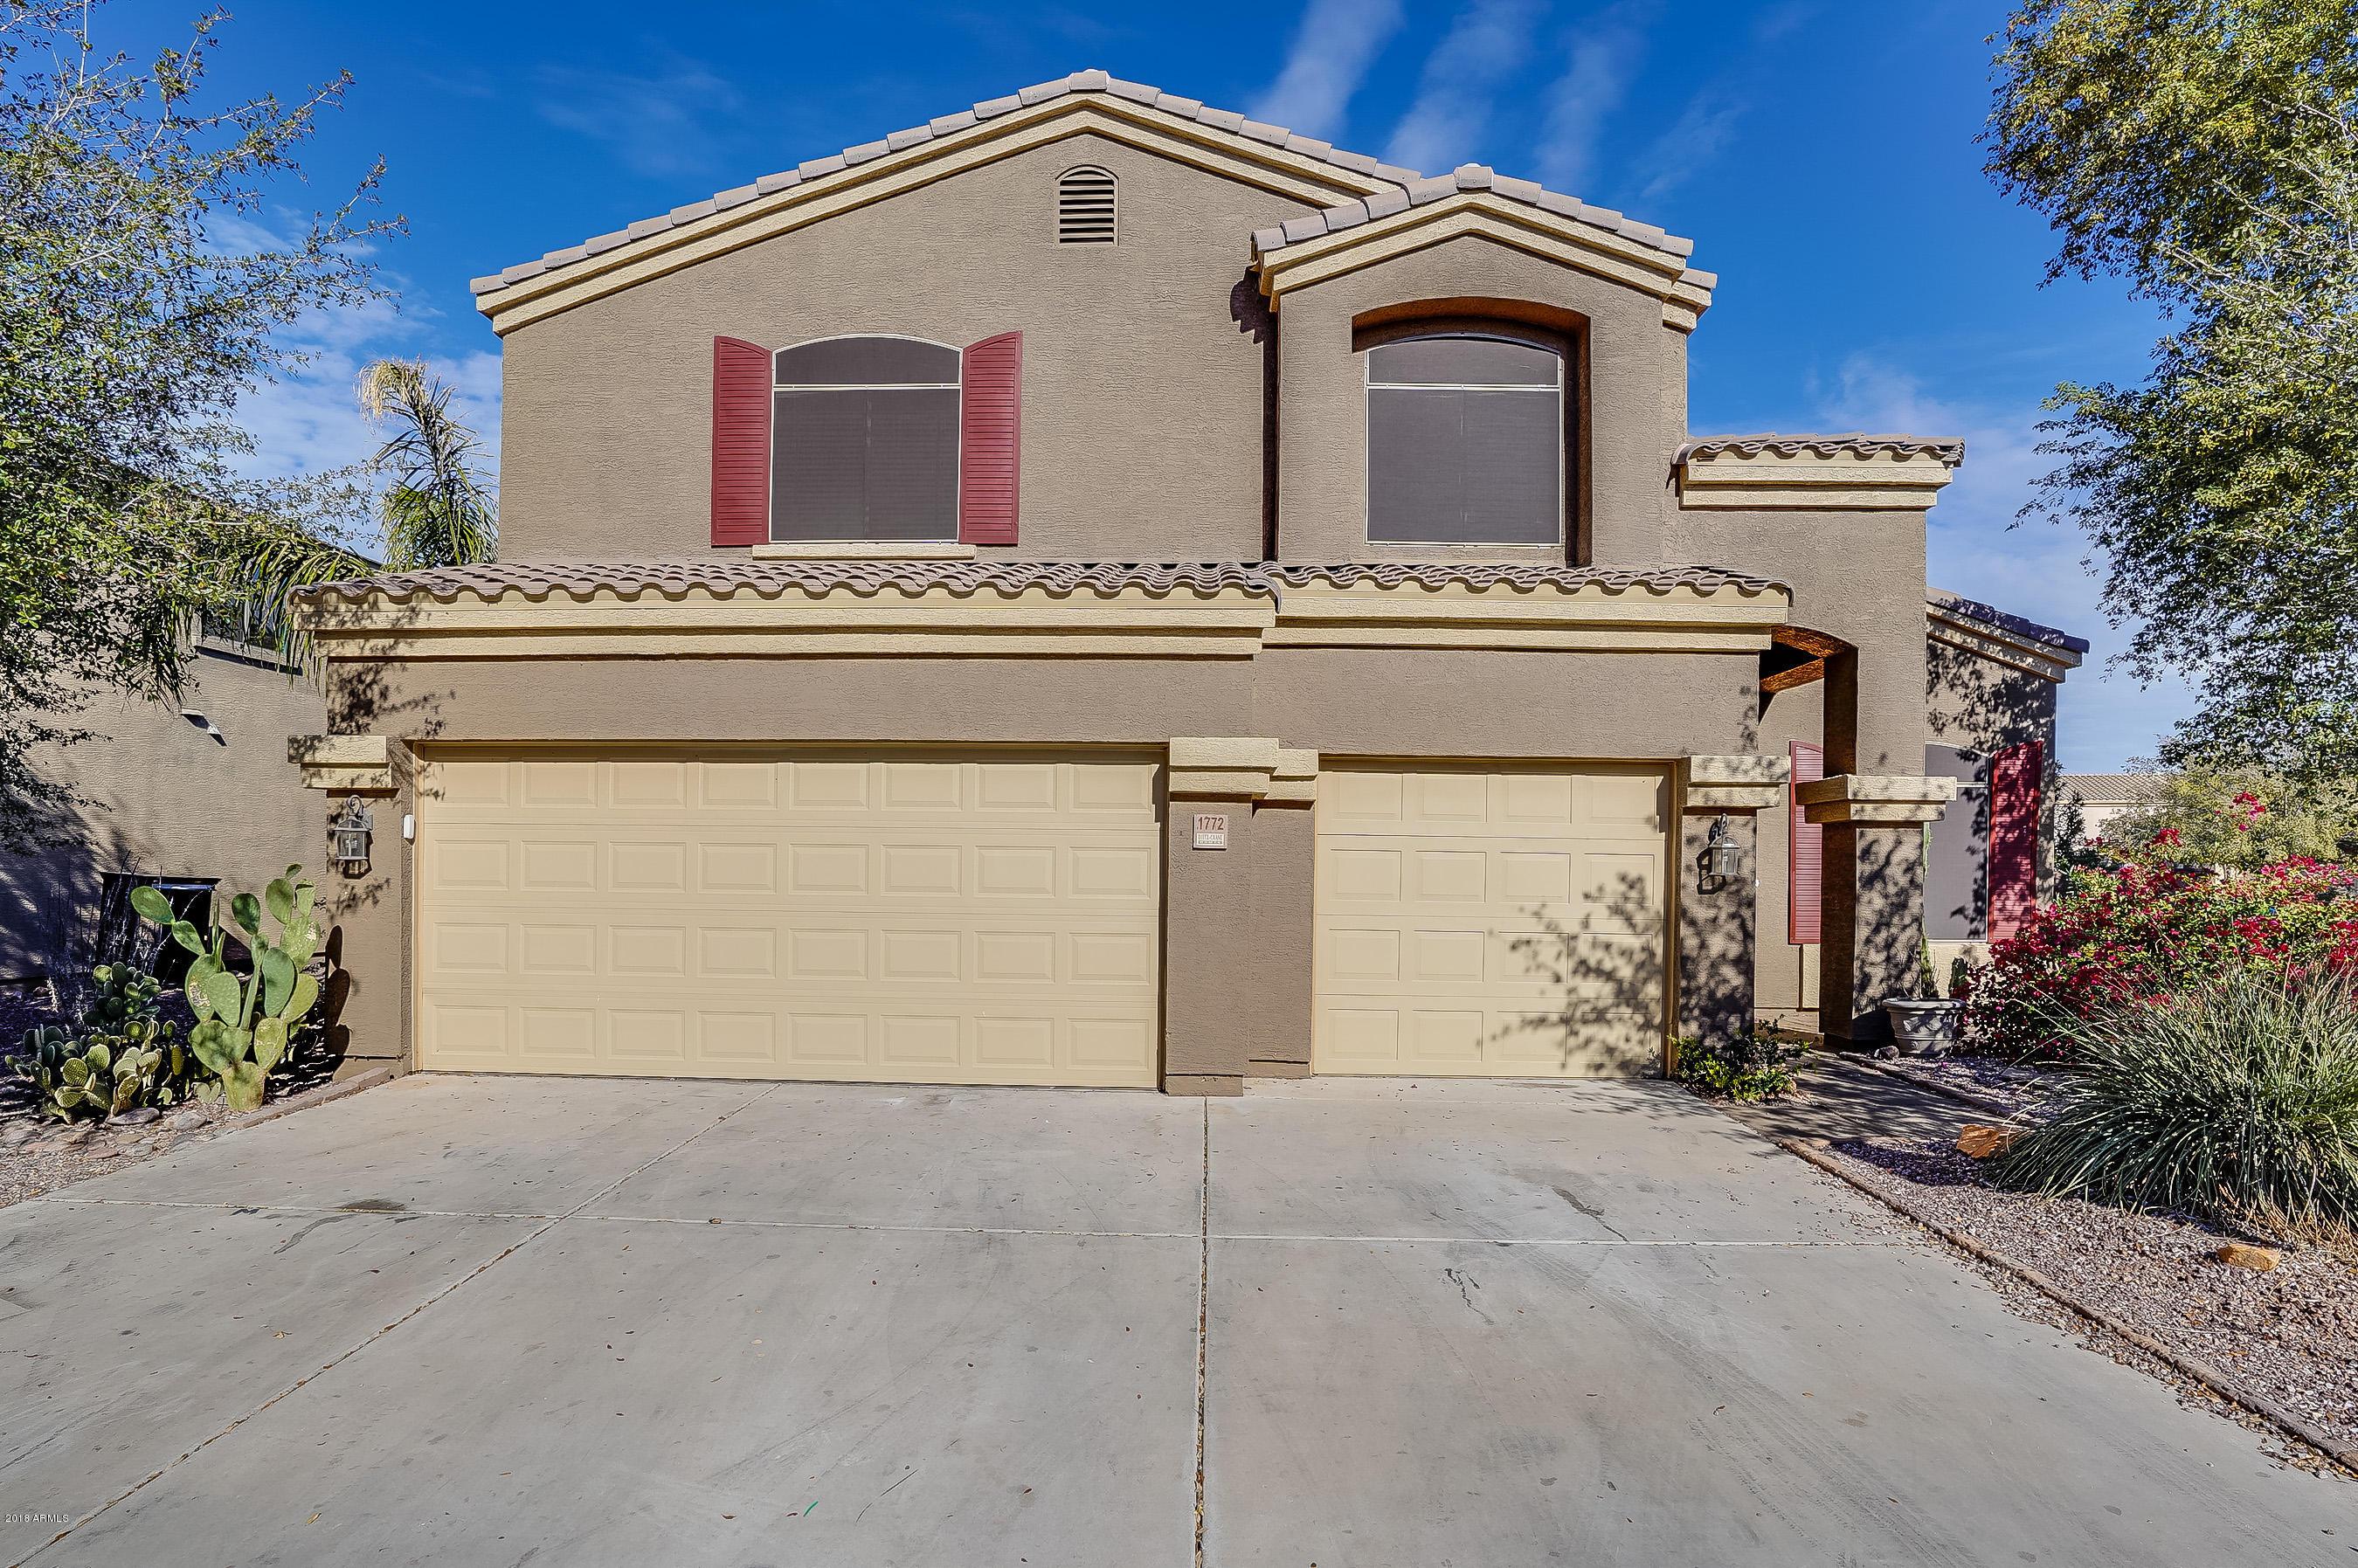 Photo for 1772 E Cardinal Drive, Casa Grande, AZ 85122 (MLS # 5853853)